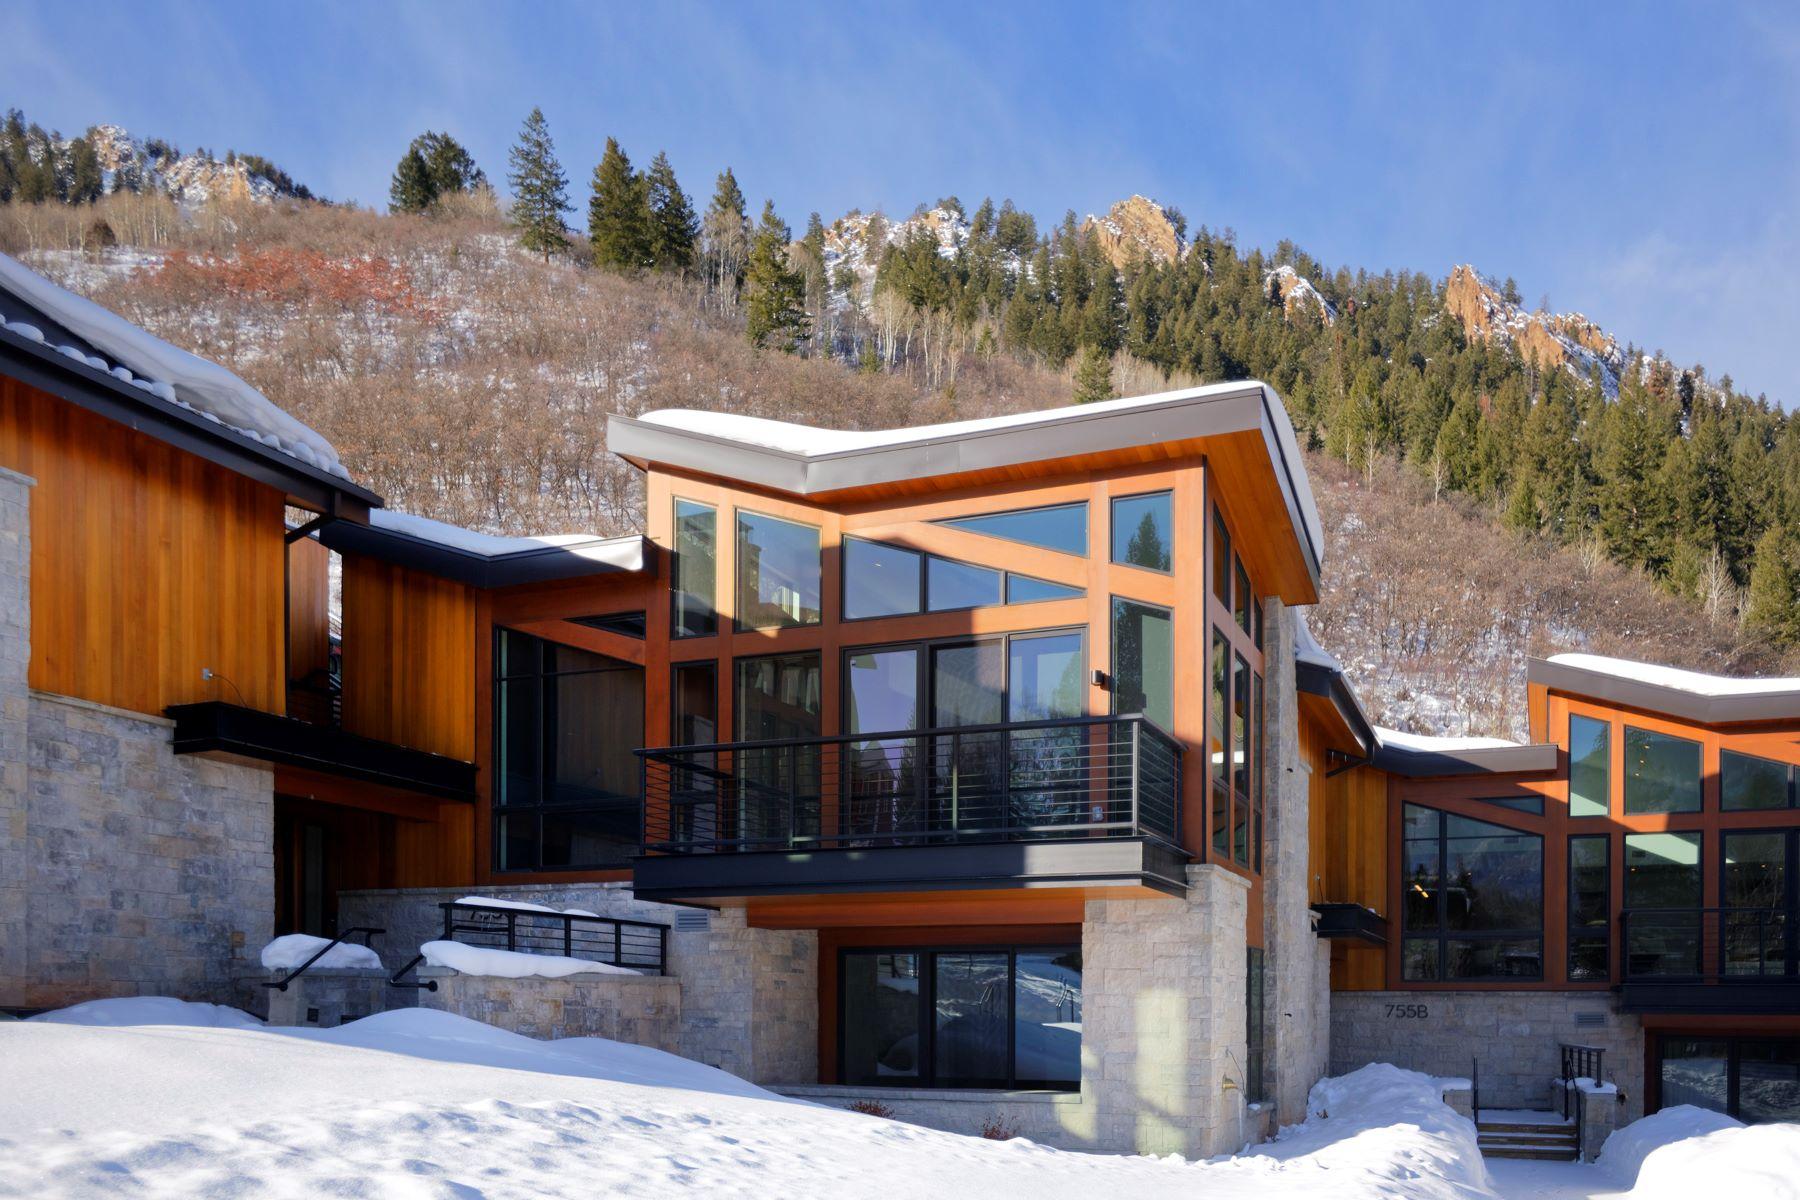 townhouses for Active at One Aspen 755 S Aspen Street Unit B Aspen, Colorado 81611 United States